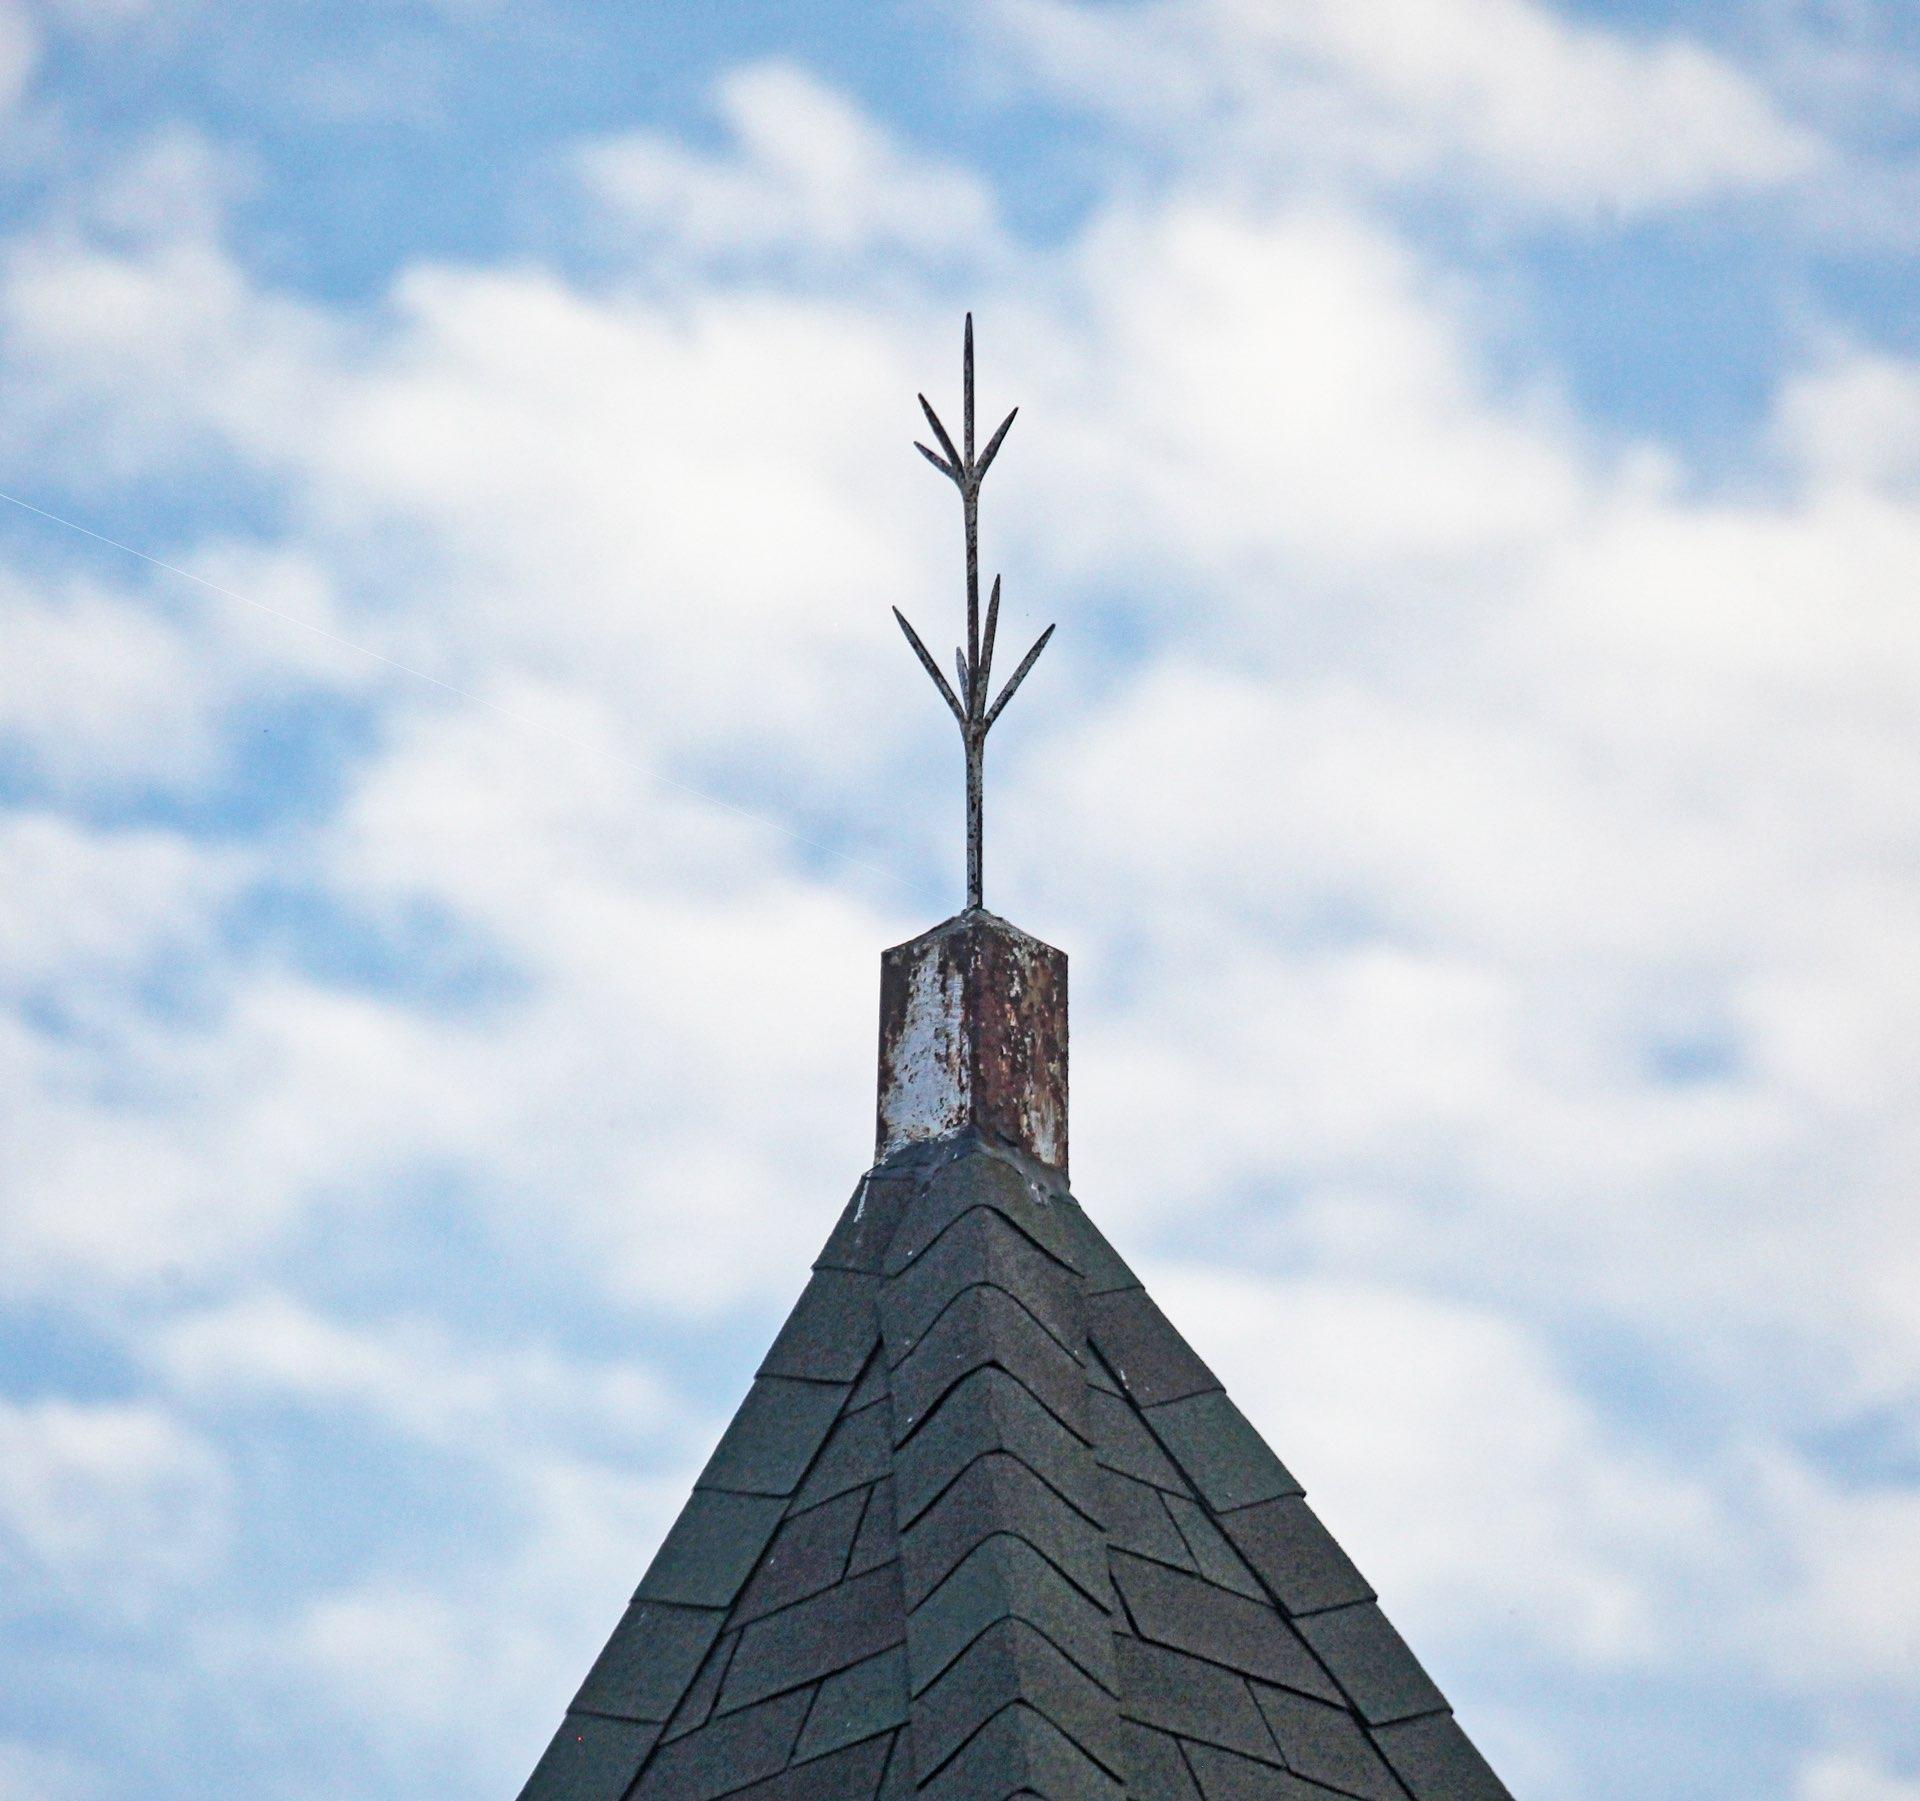 Rooftop lighting rod